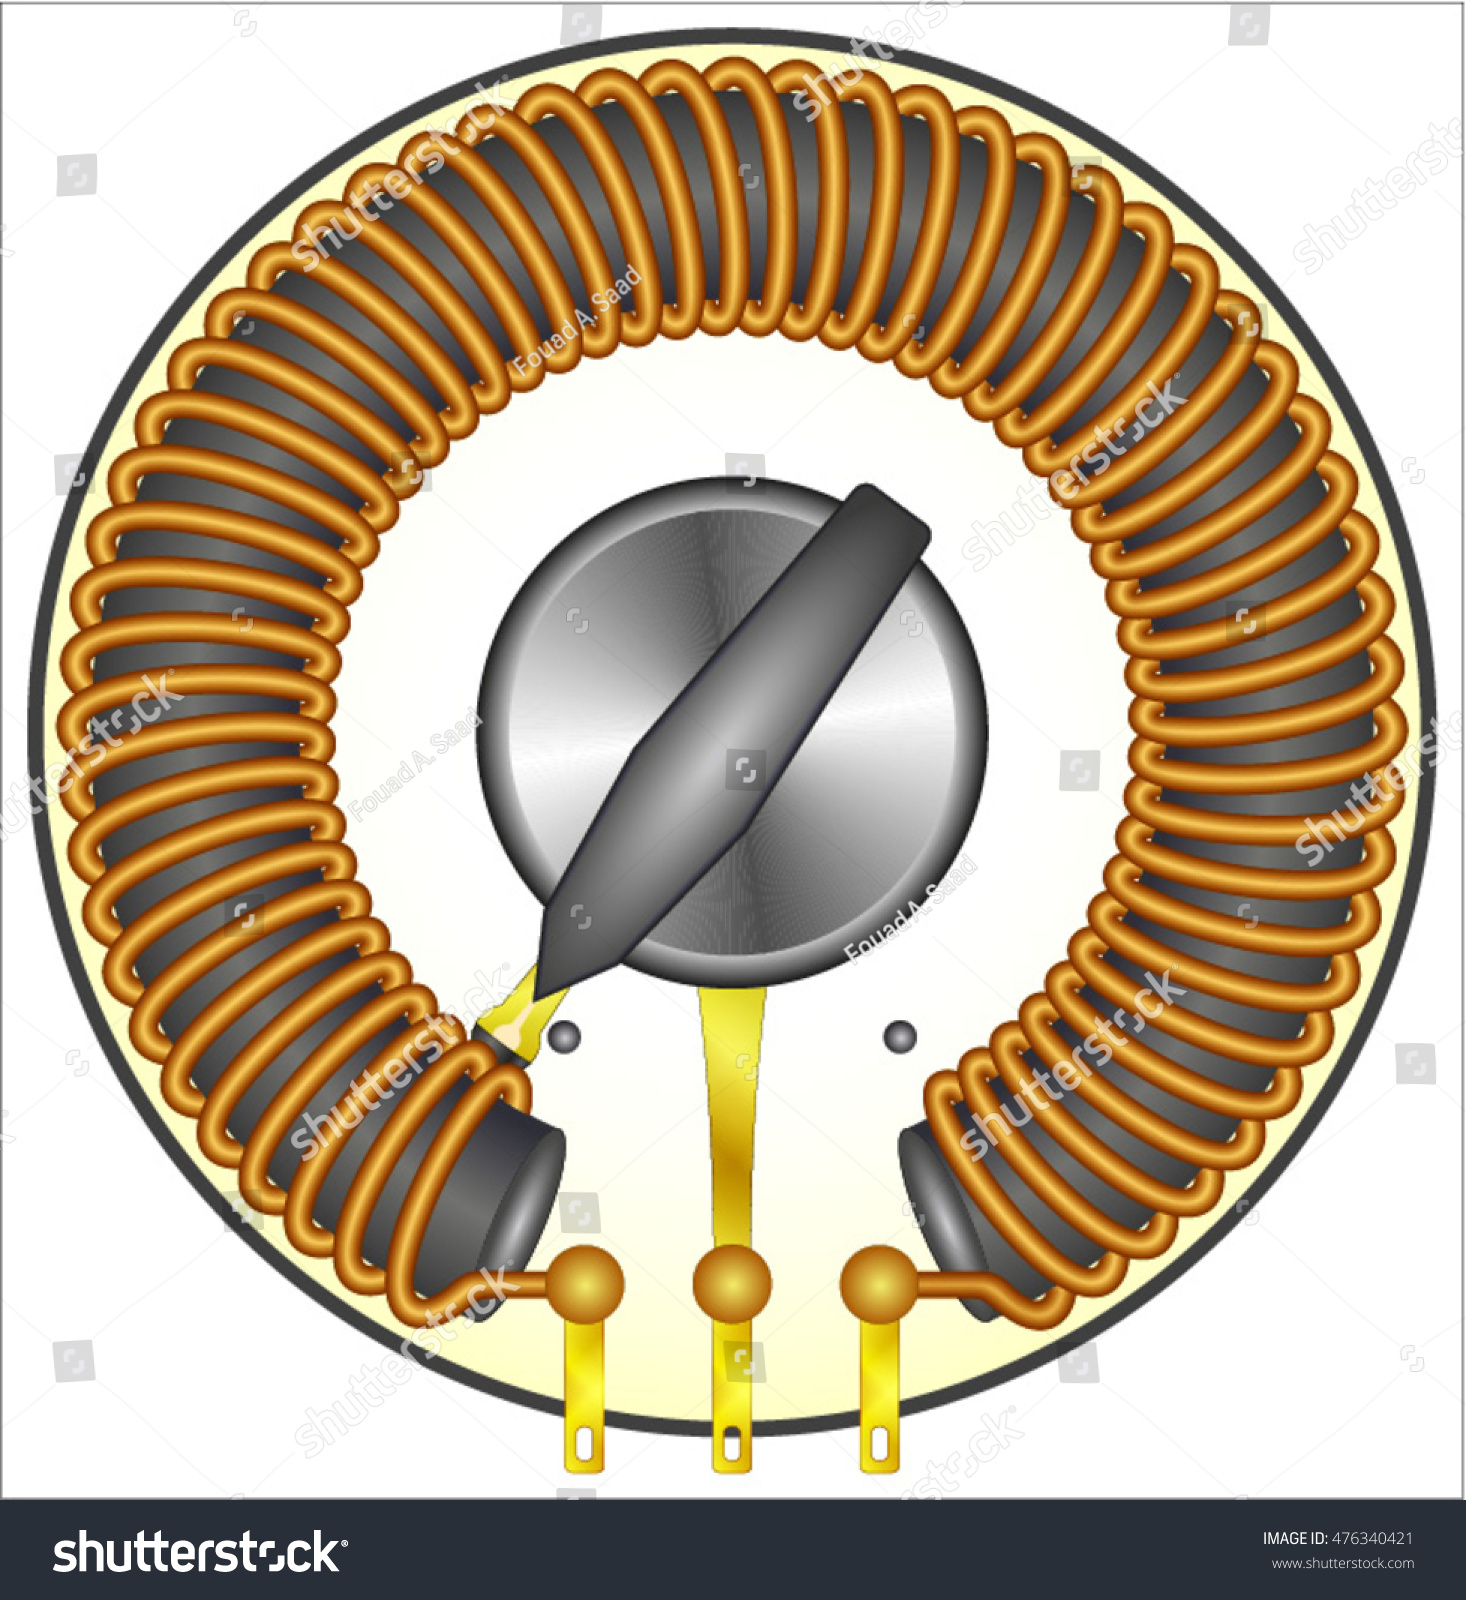 Coil (air core) symbol